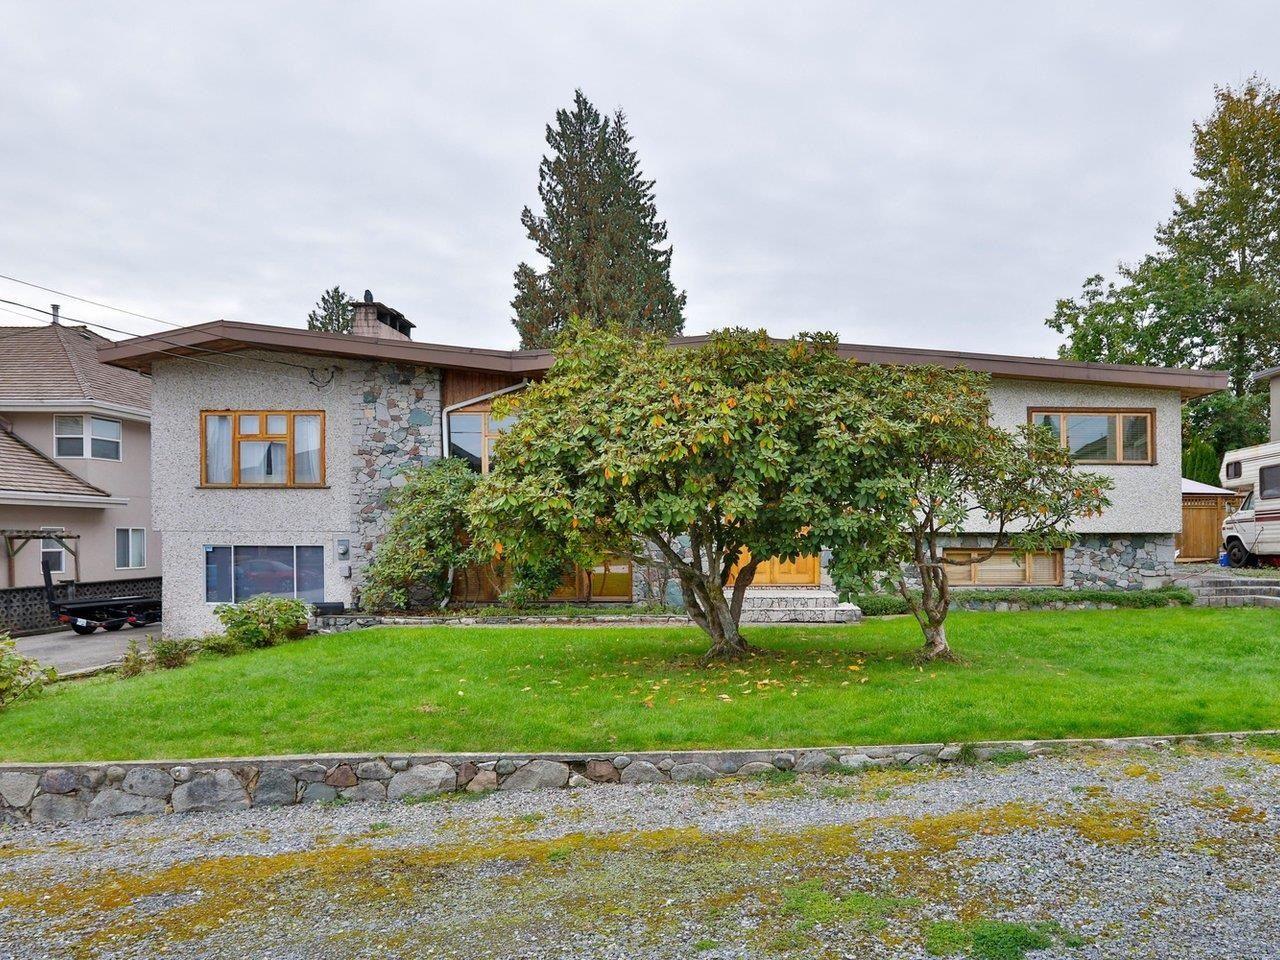 Main Photo: 1114 REGAN Avenue in Coquitlam: Central Coquitlam House for sale : MLS®# R2623623